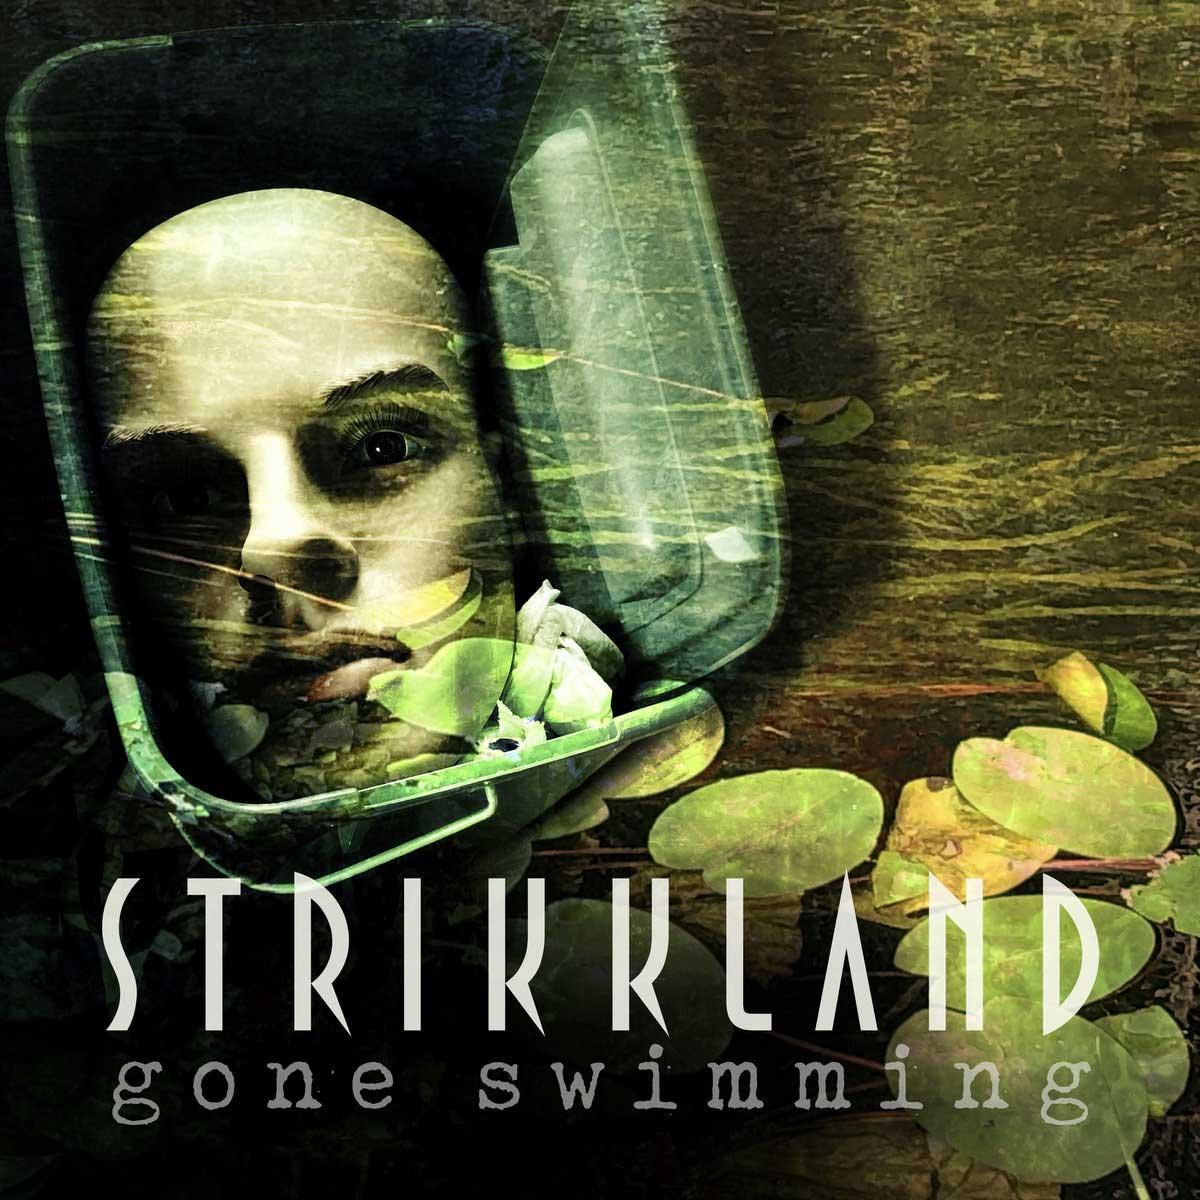 Strikkland - Gone Swimming - Strikkland - Gone Swimming